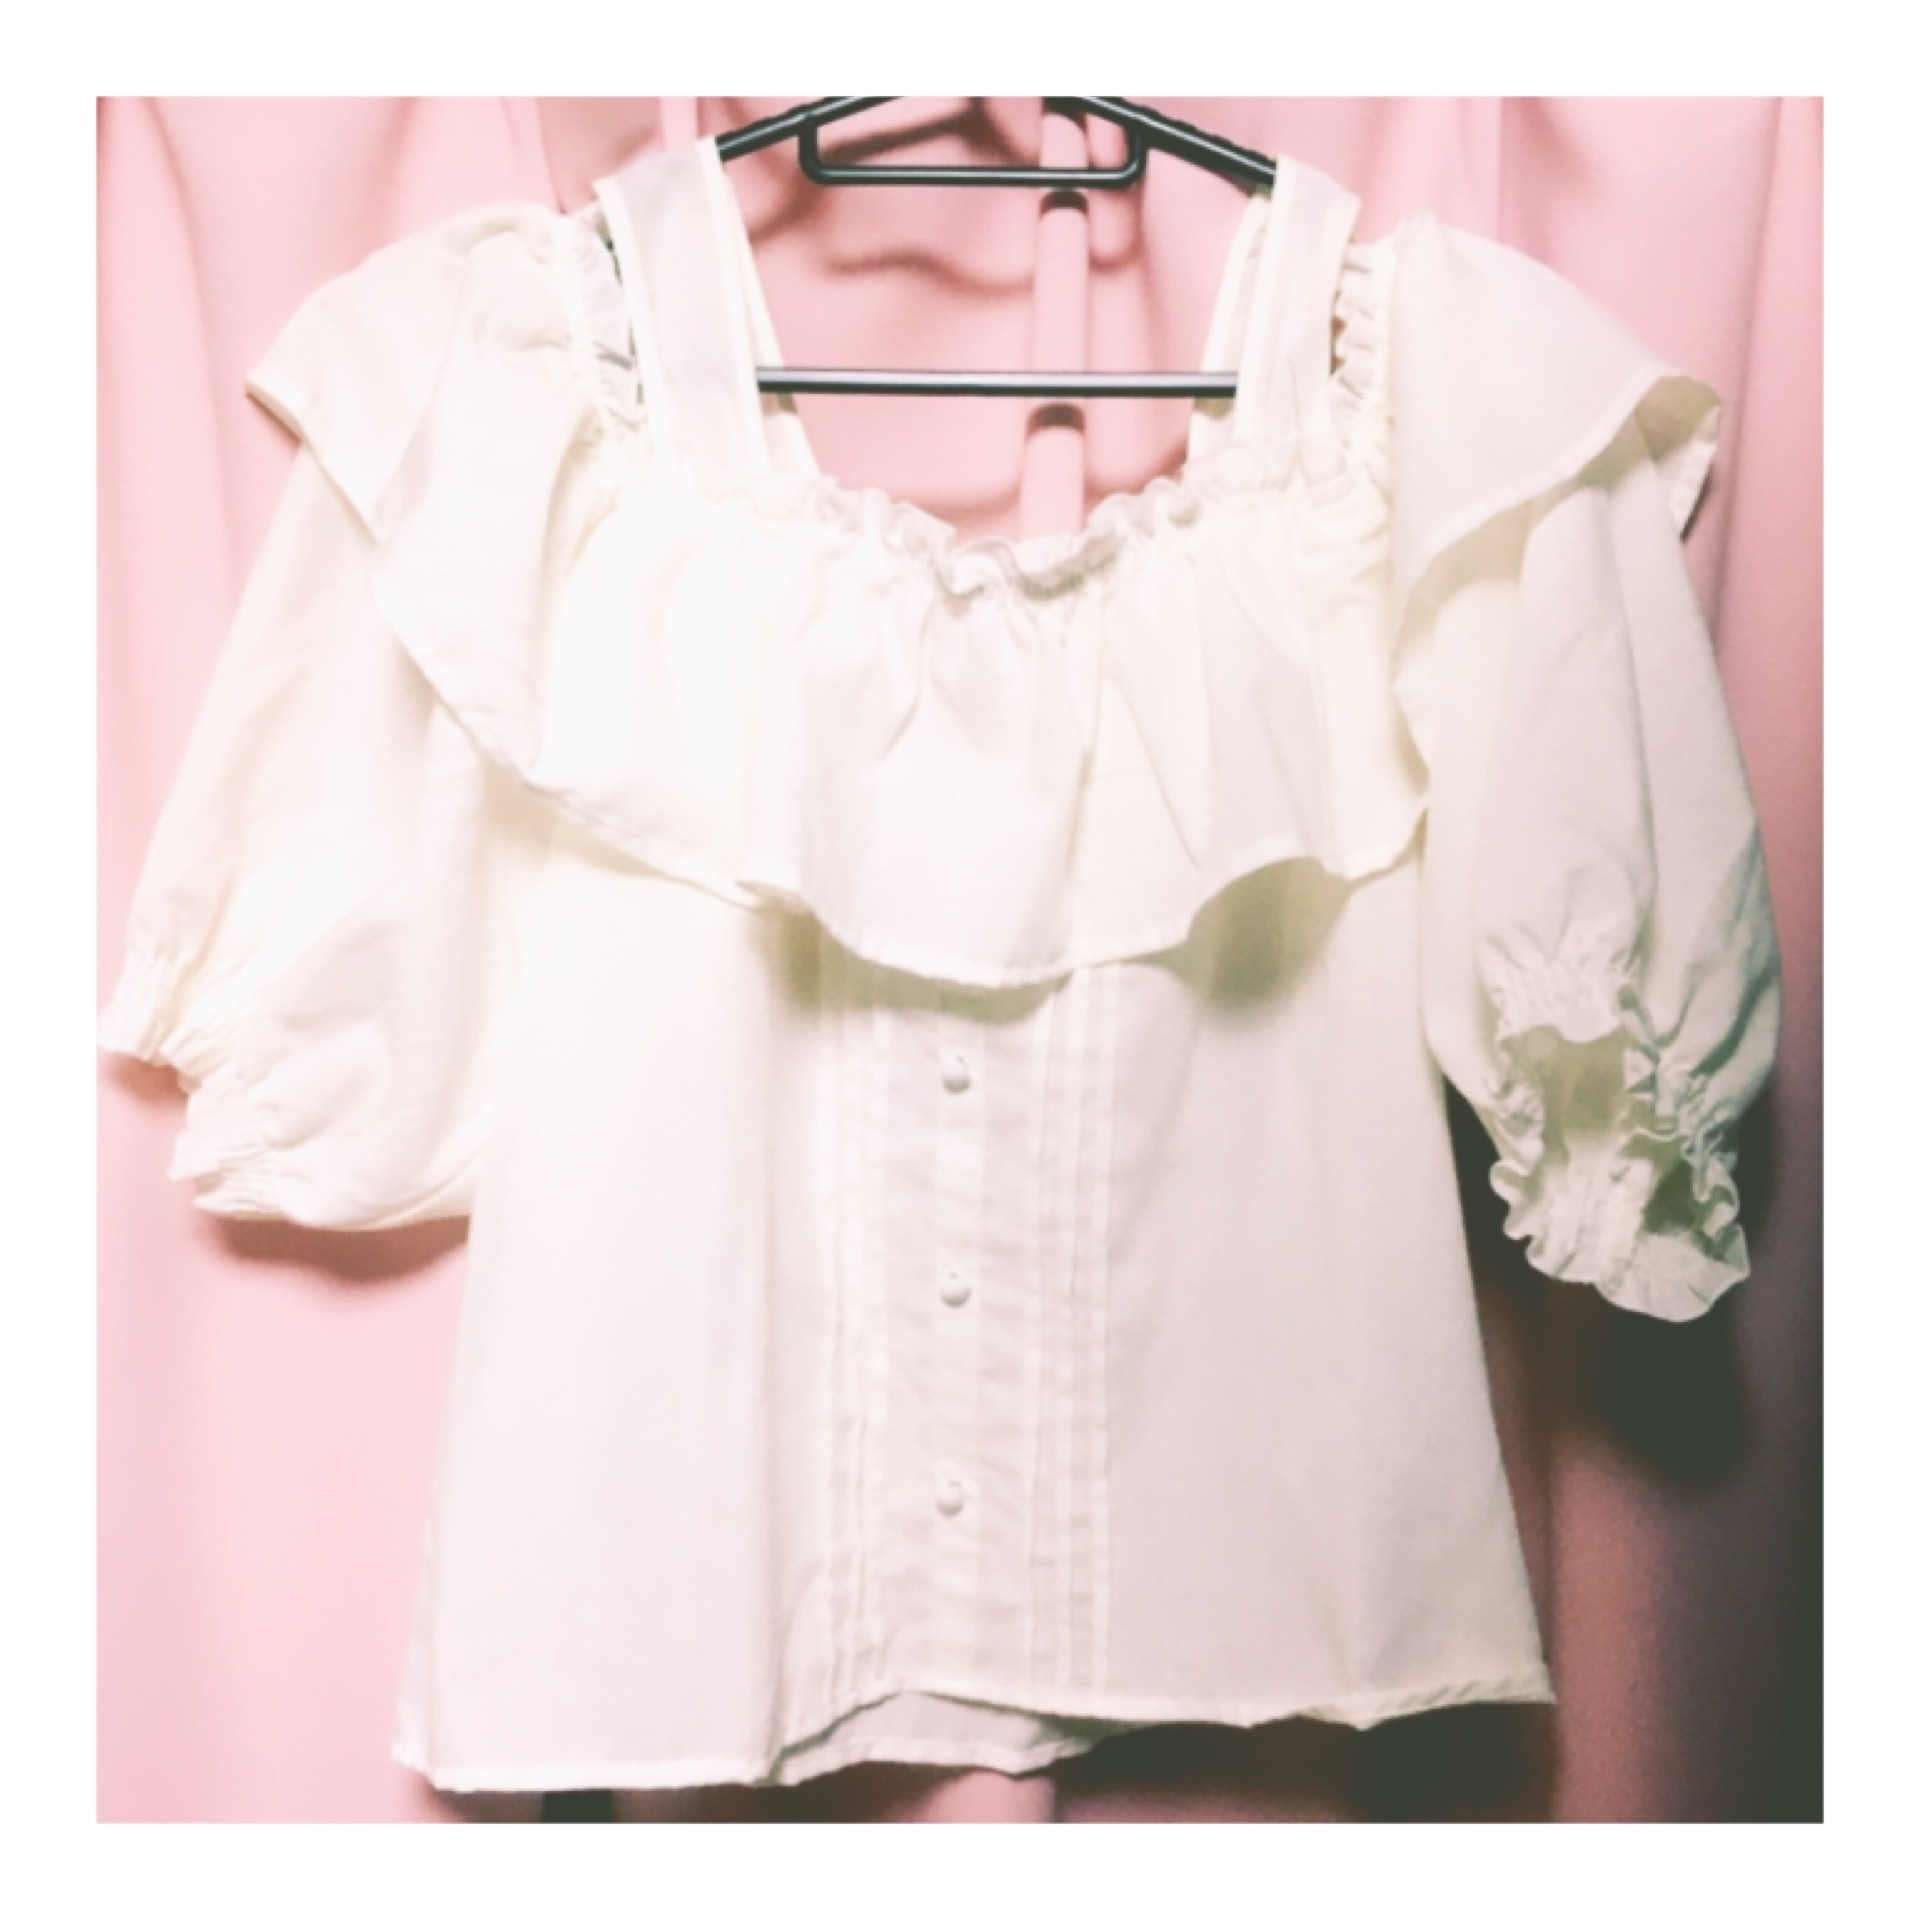 E hyphen world gallery♡ファッション通販サイト《FLAG SHOP》購入品♩_1_4